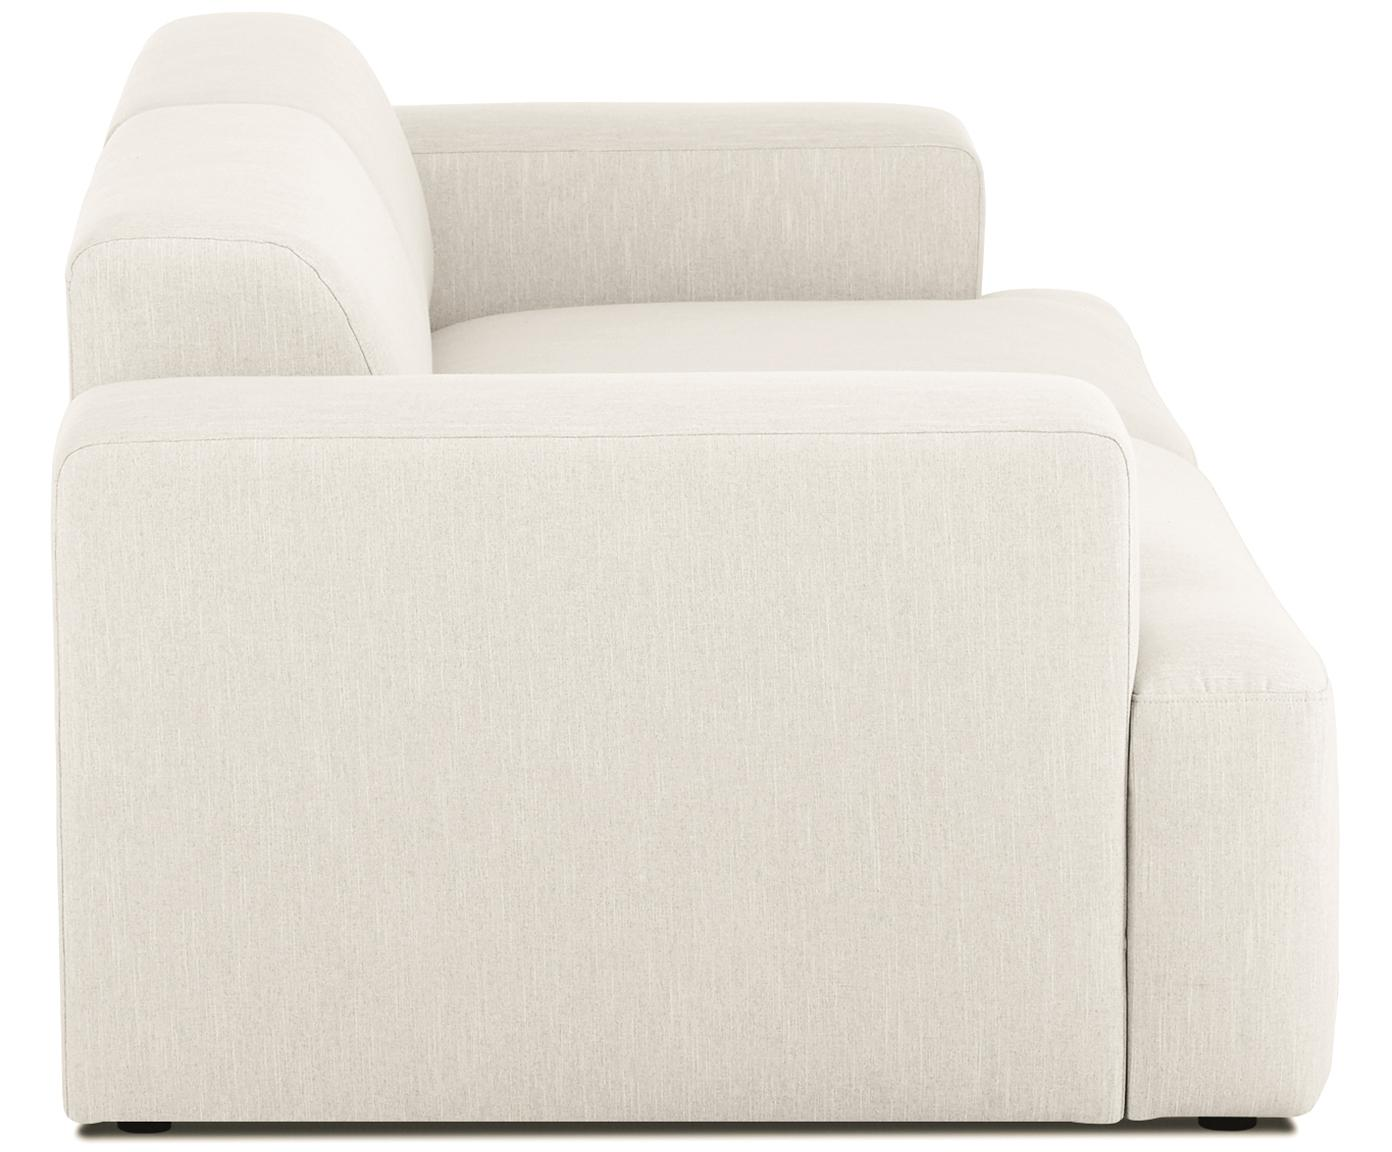 Bank Melva (3-zits), Bekleding: polyester, Frame: massief grenenhout, spaan, Poten: grenenhout, Geweven stof beige, B 240 x D 101 cm